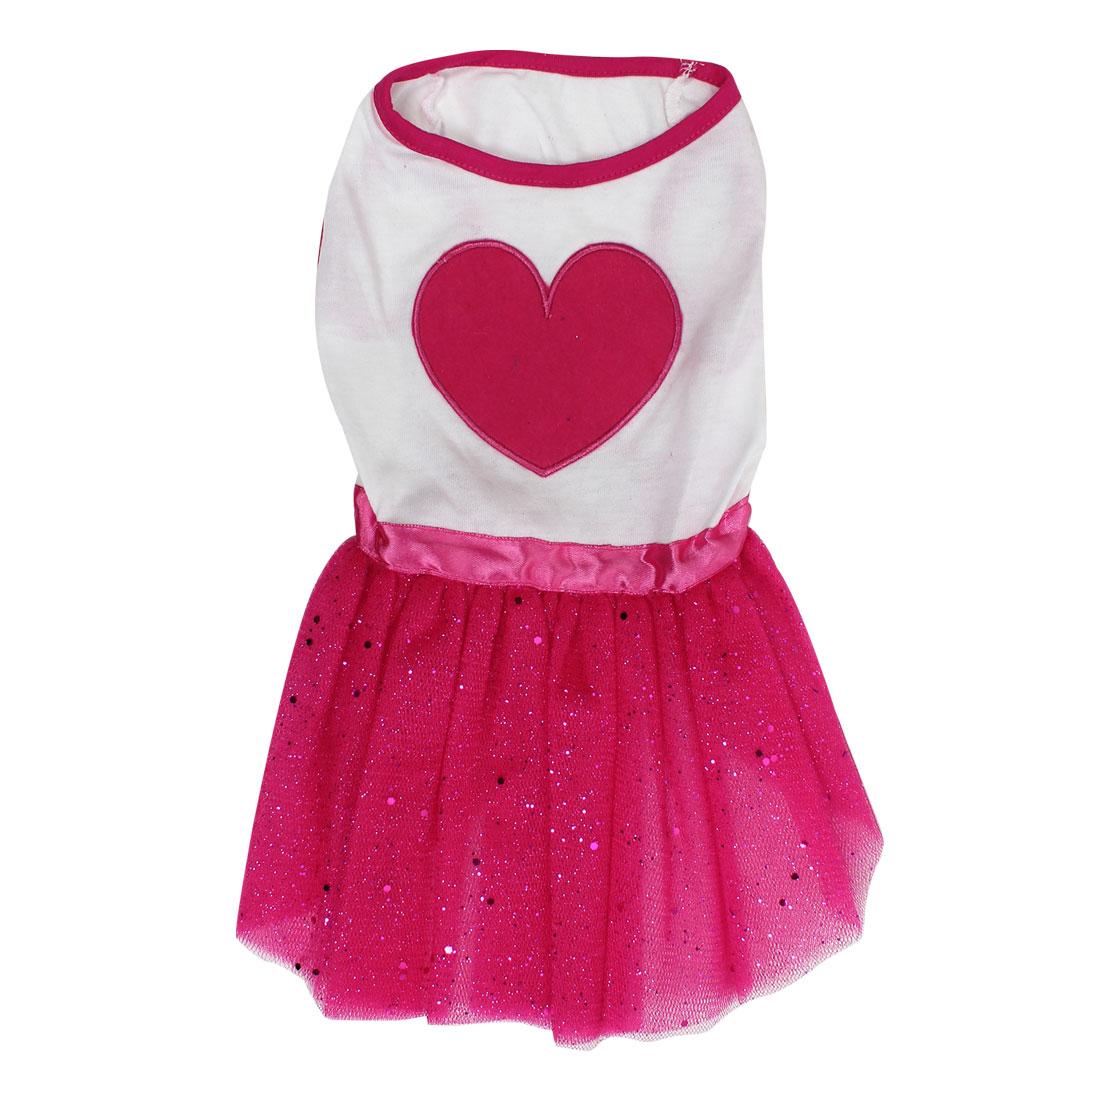 Pet Dog Doggie Heart Shaped Pattern Summer Ballet Dress Skirt White Red Size XS